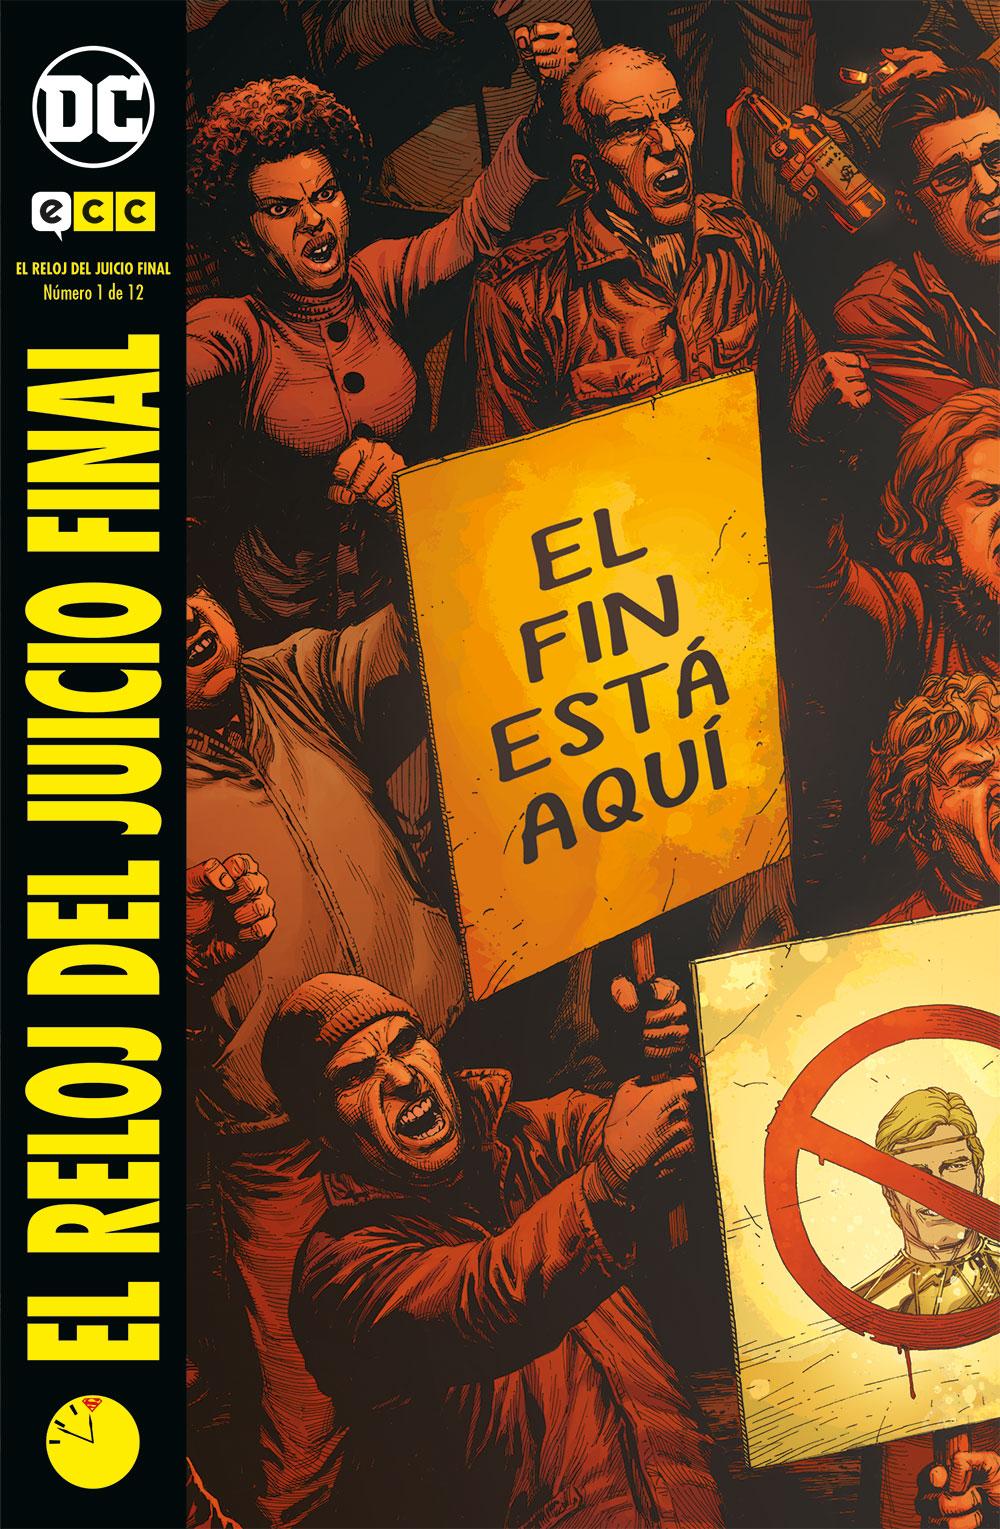 El Reloj Del Juicio Final Num 01 De 12 Ecc Comics